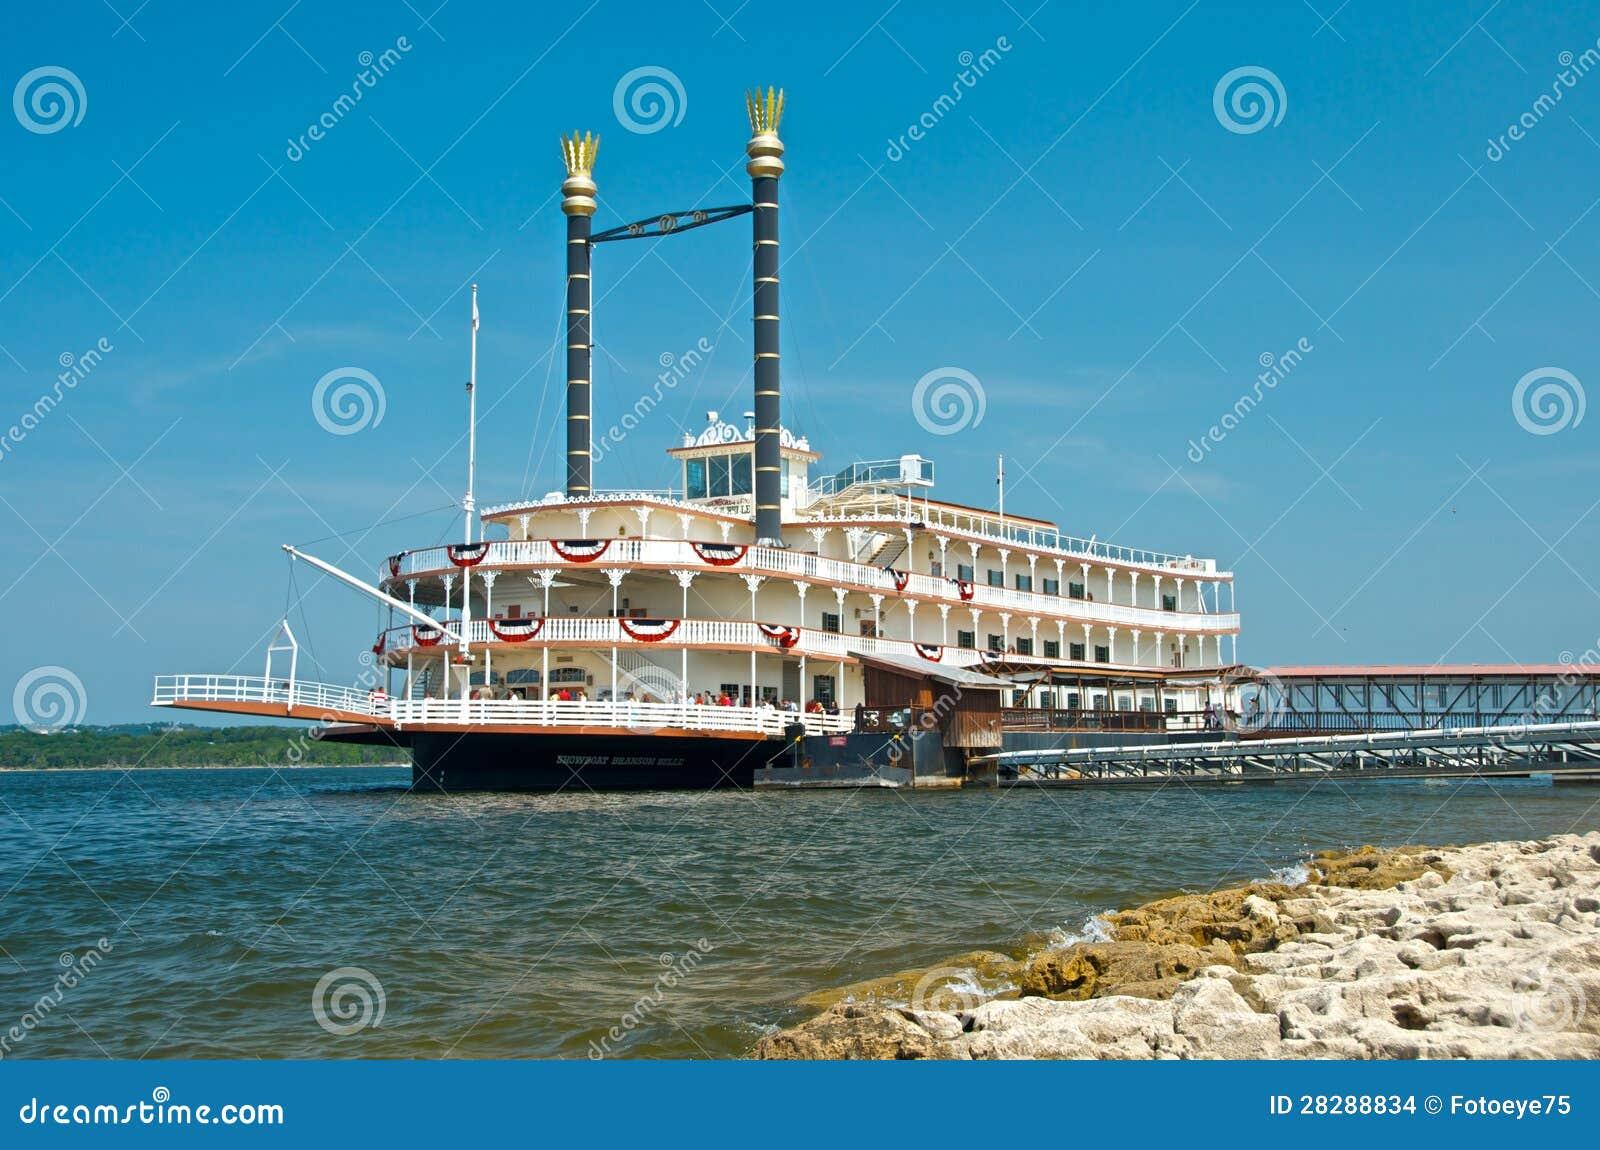 The Branson Belle Showboat